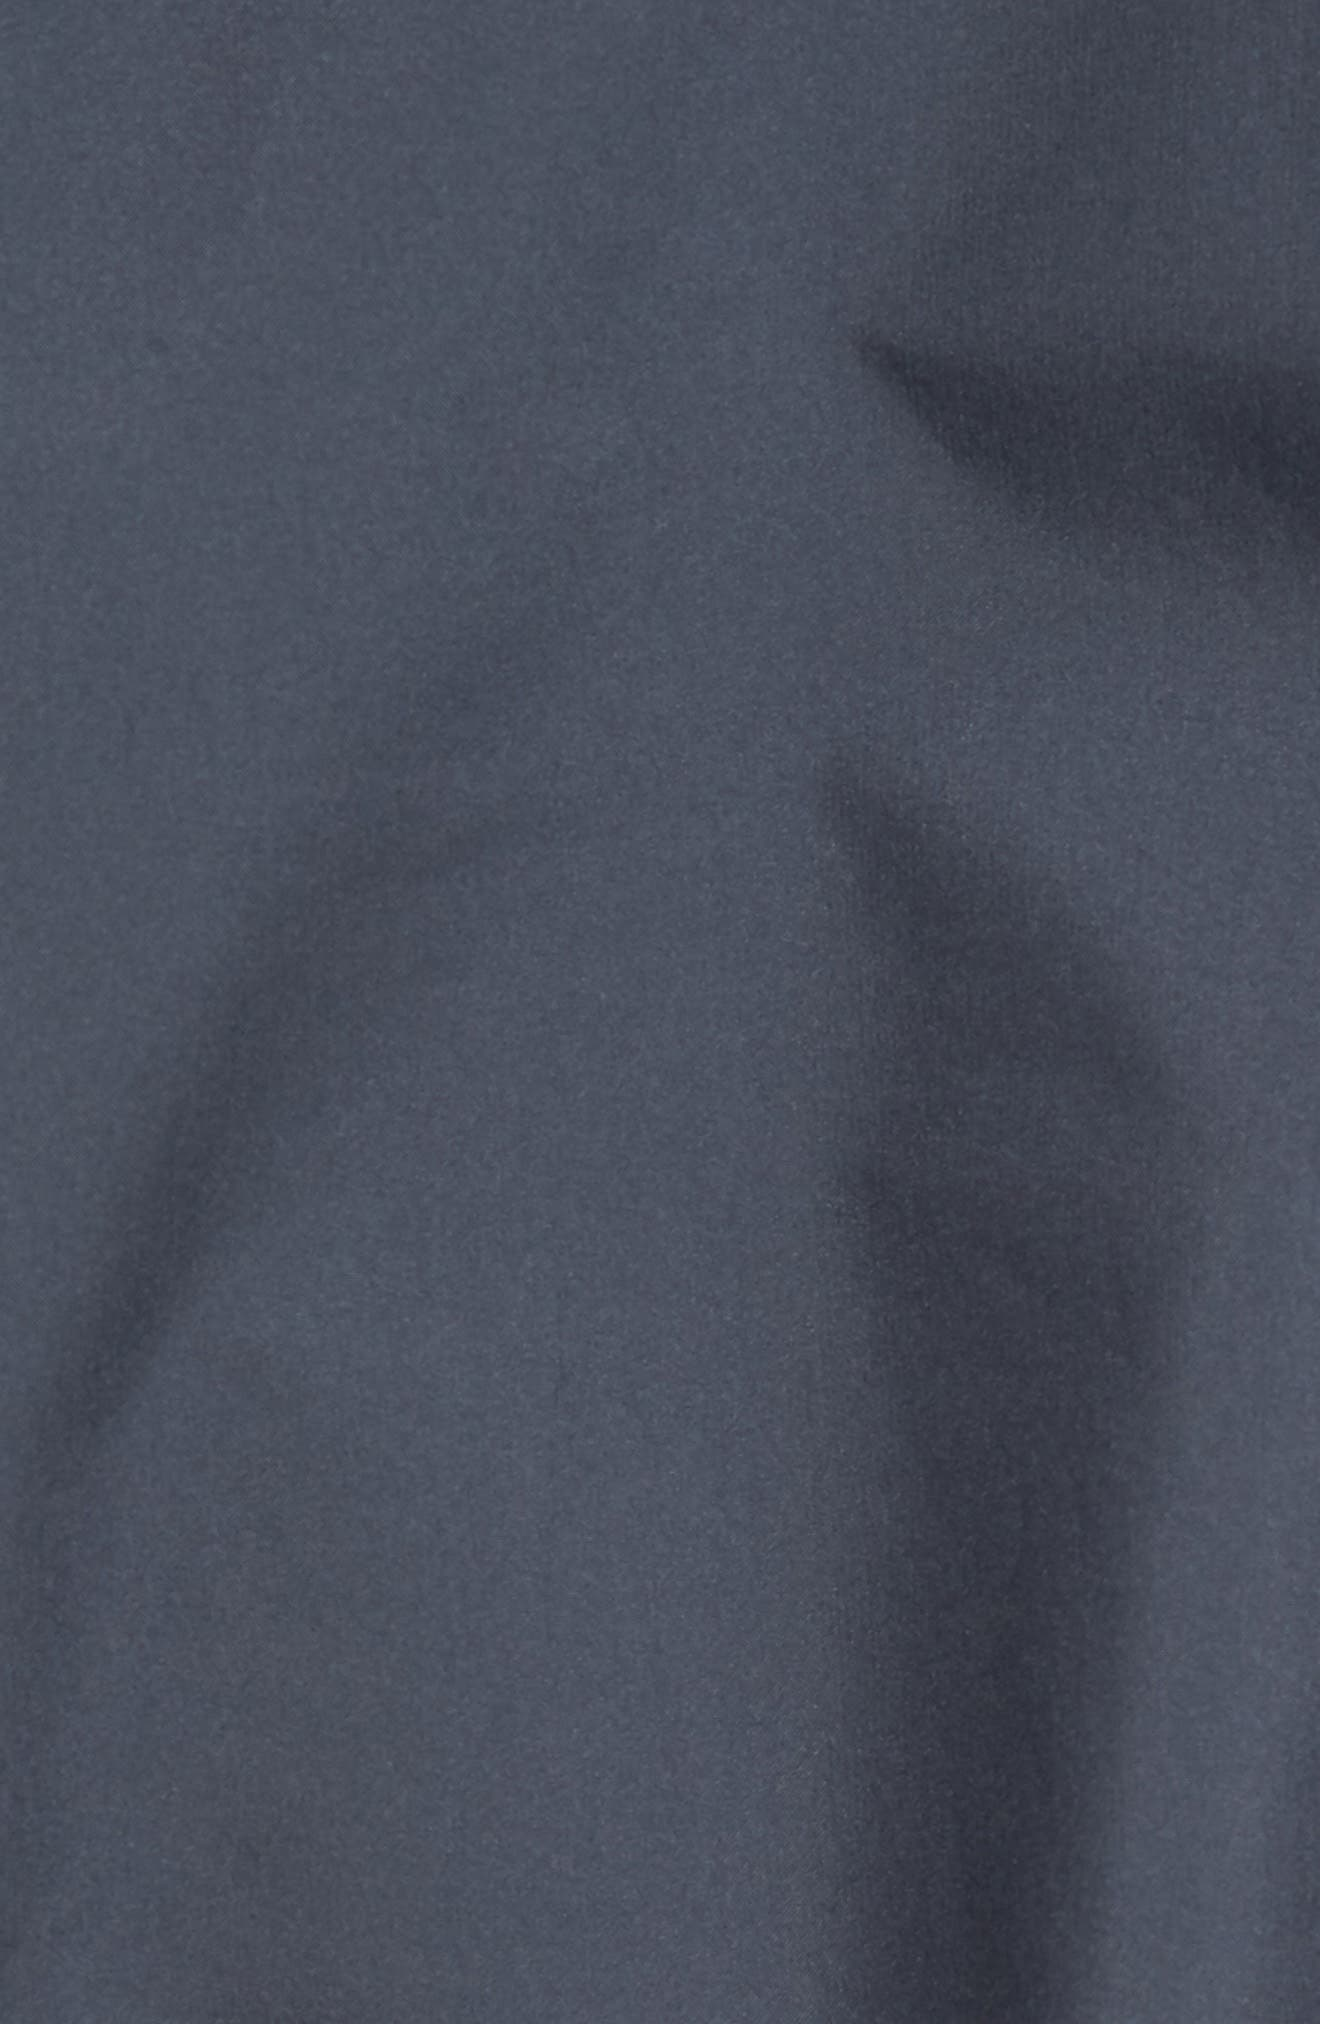 Regular Fit Jacket,                             Alternate thumbnail 6, color,                             020